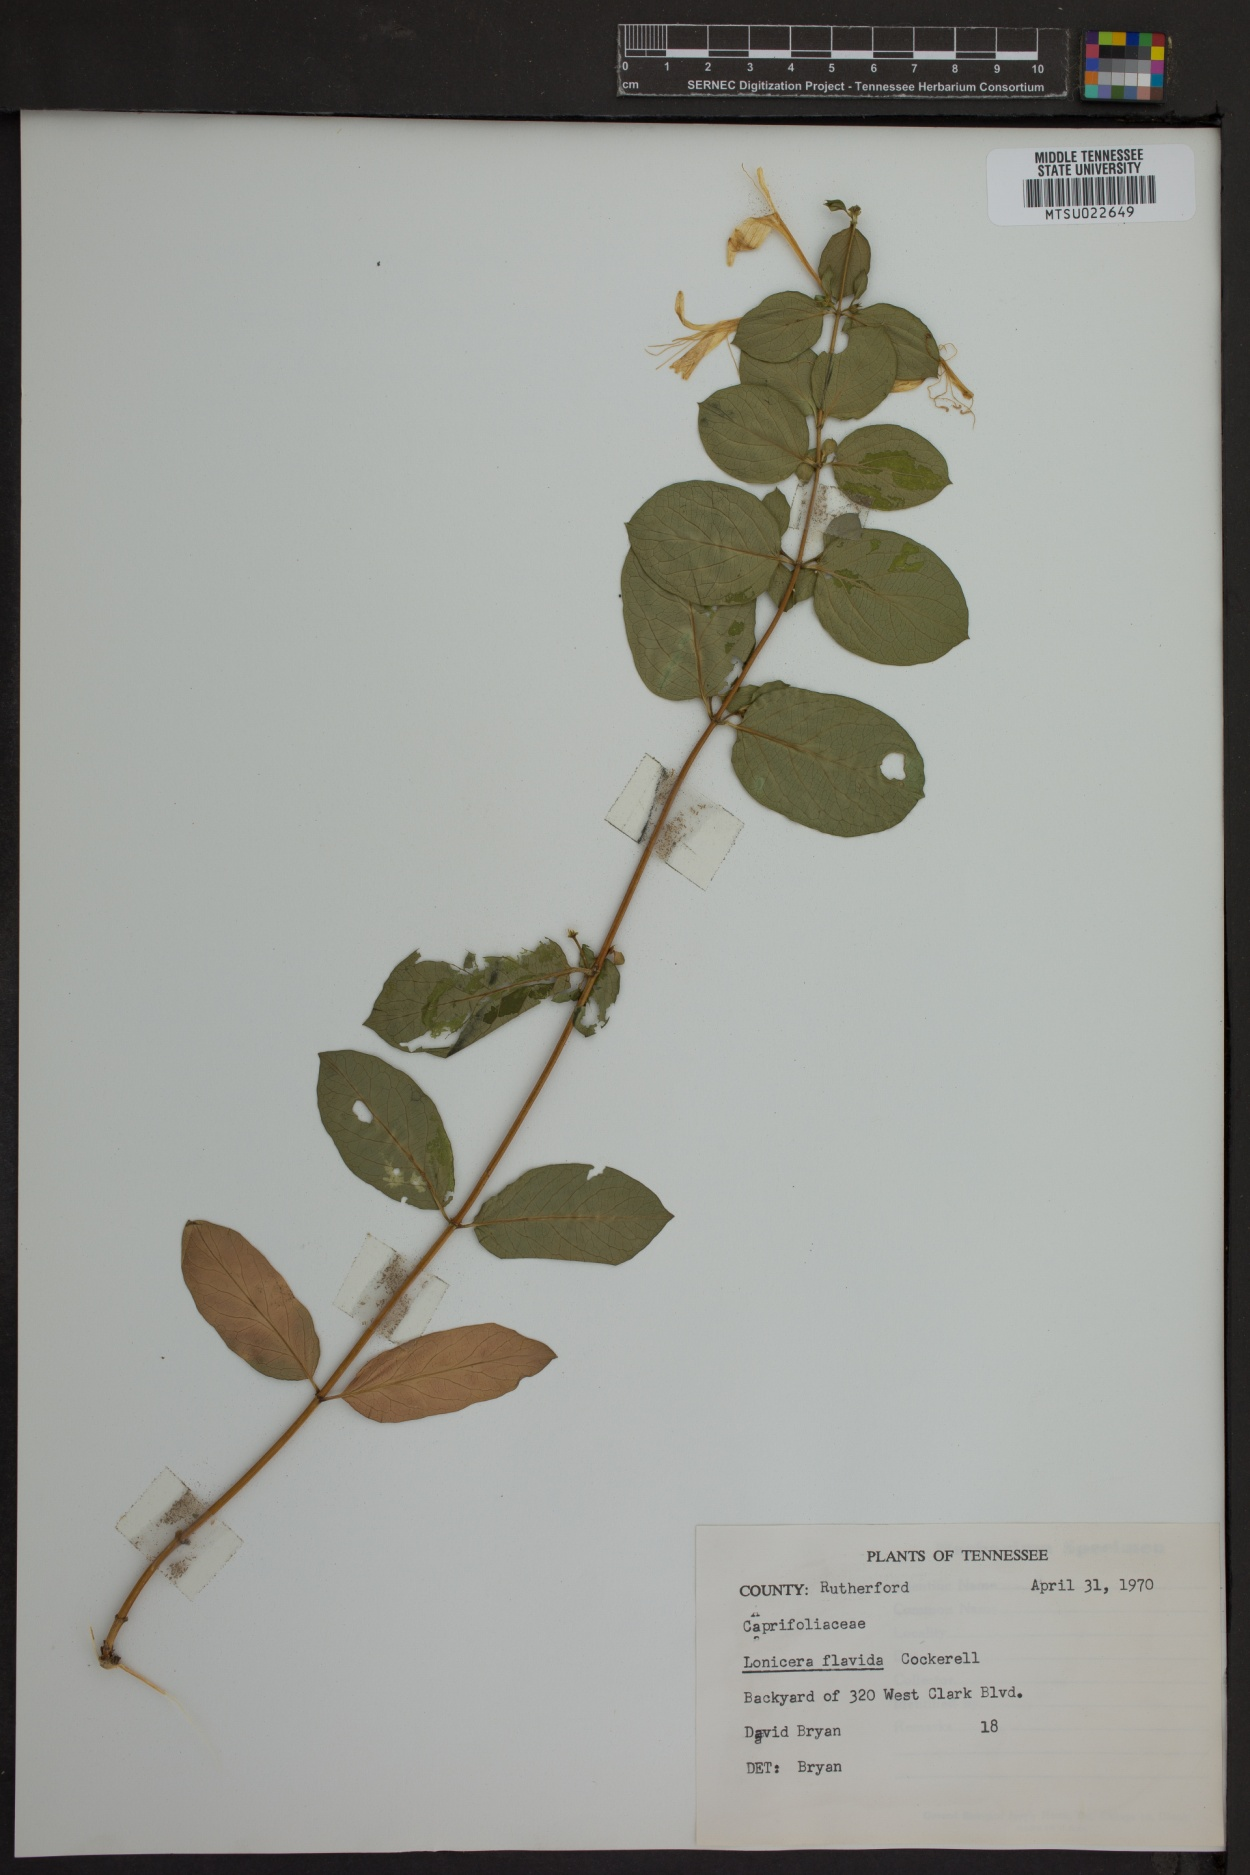 Lonicera flavida image